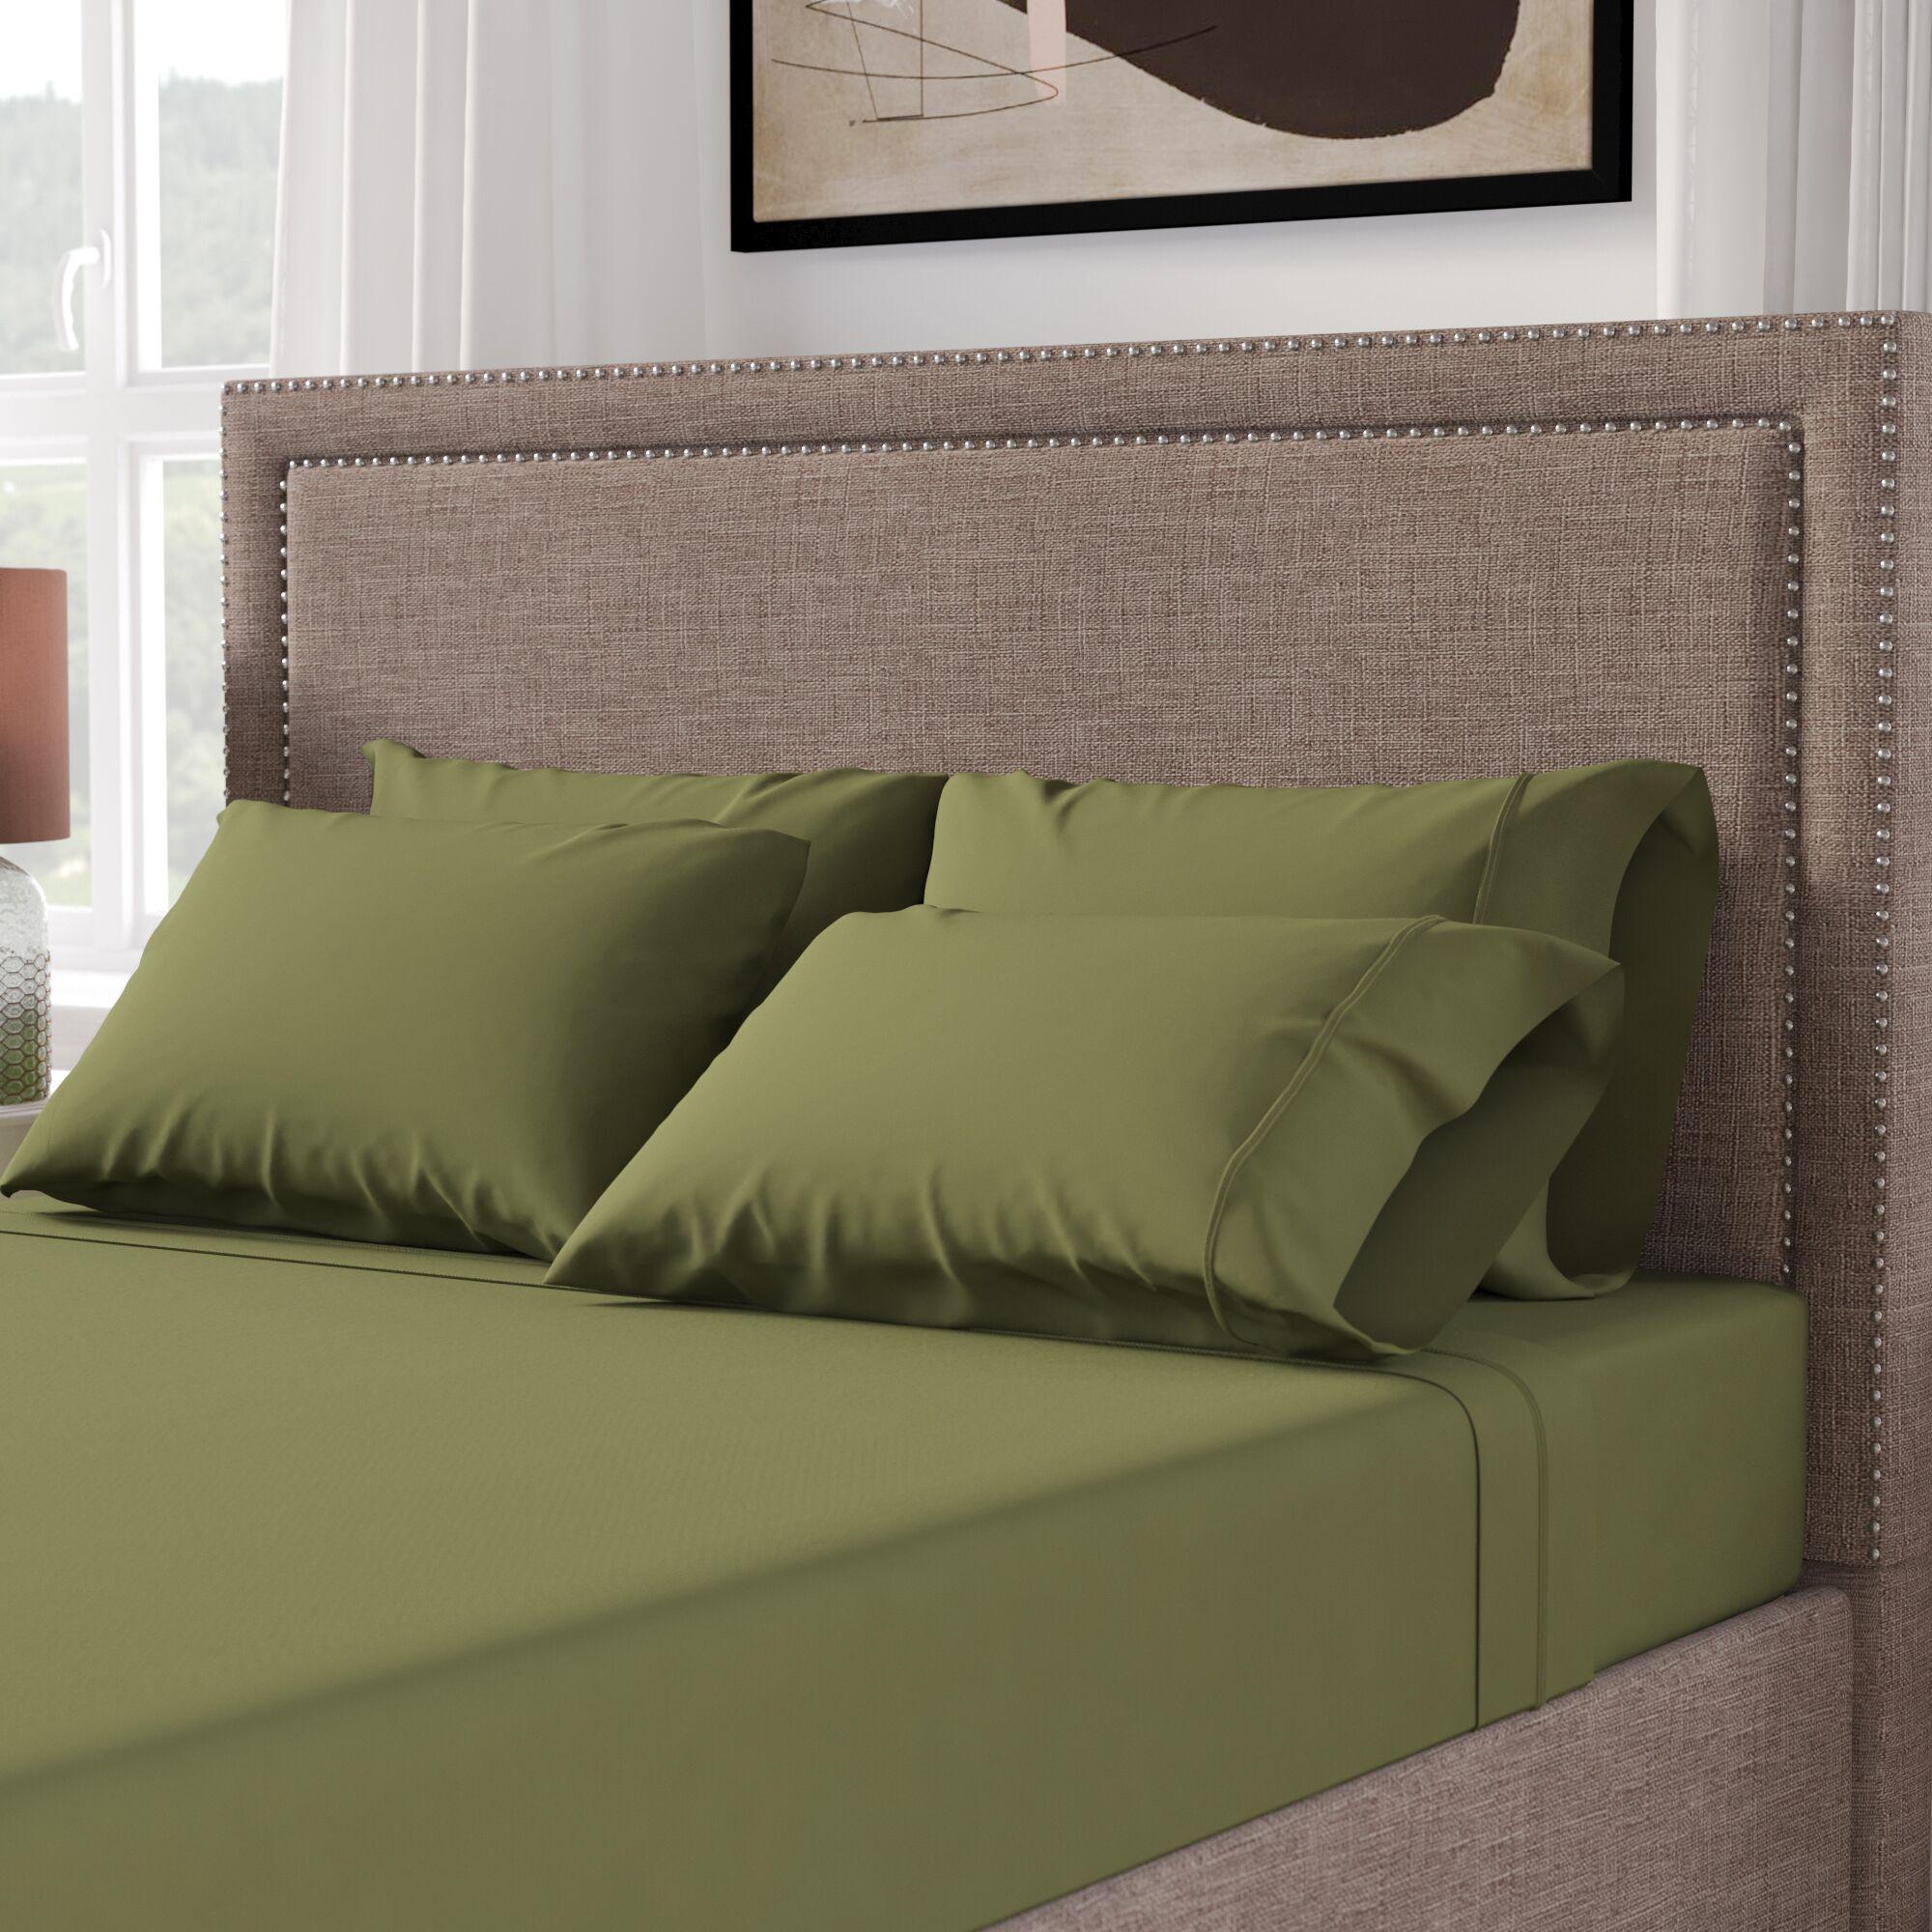 Cullen 800 Thread Count 100% Cotton Sheet Set Size: Full/Double, Color: Sage